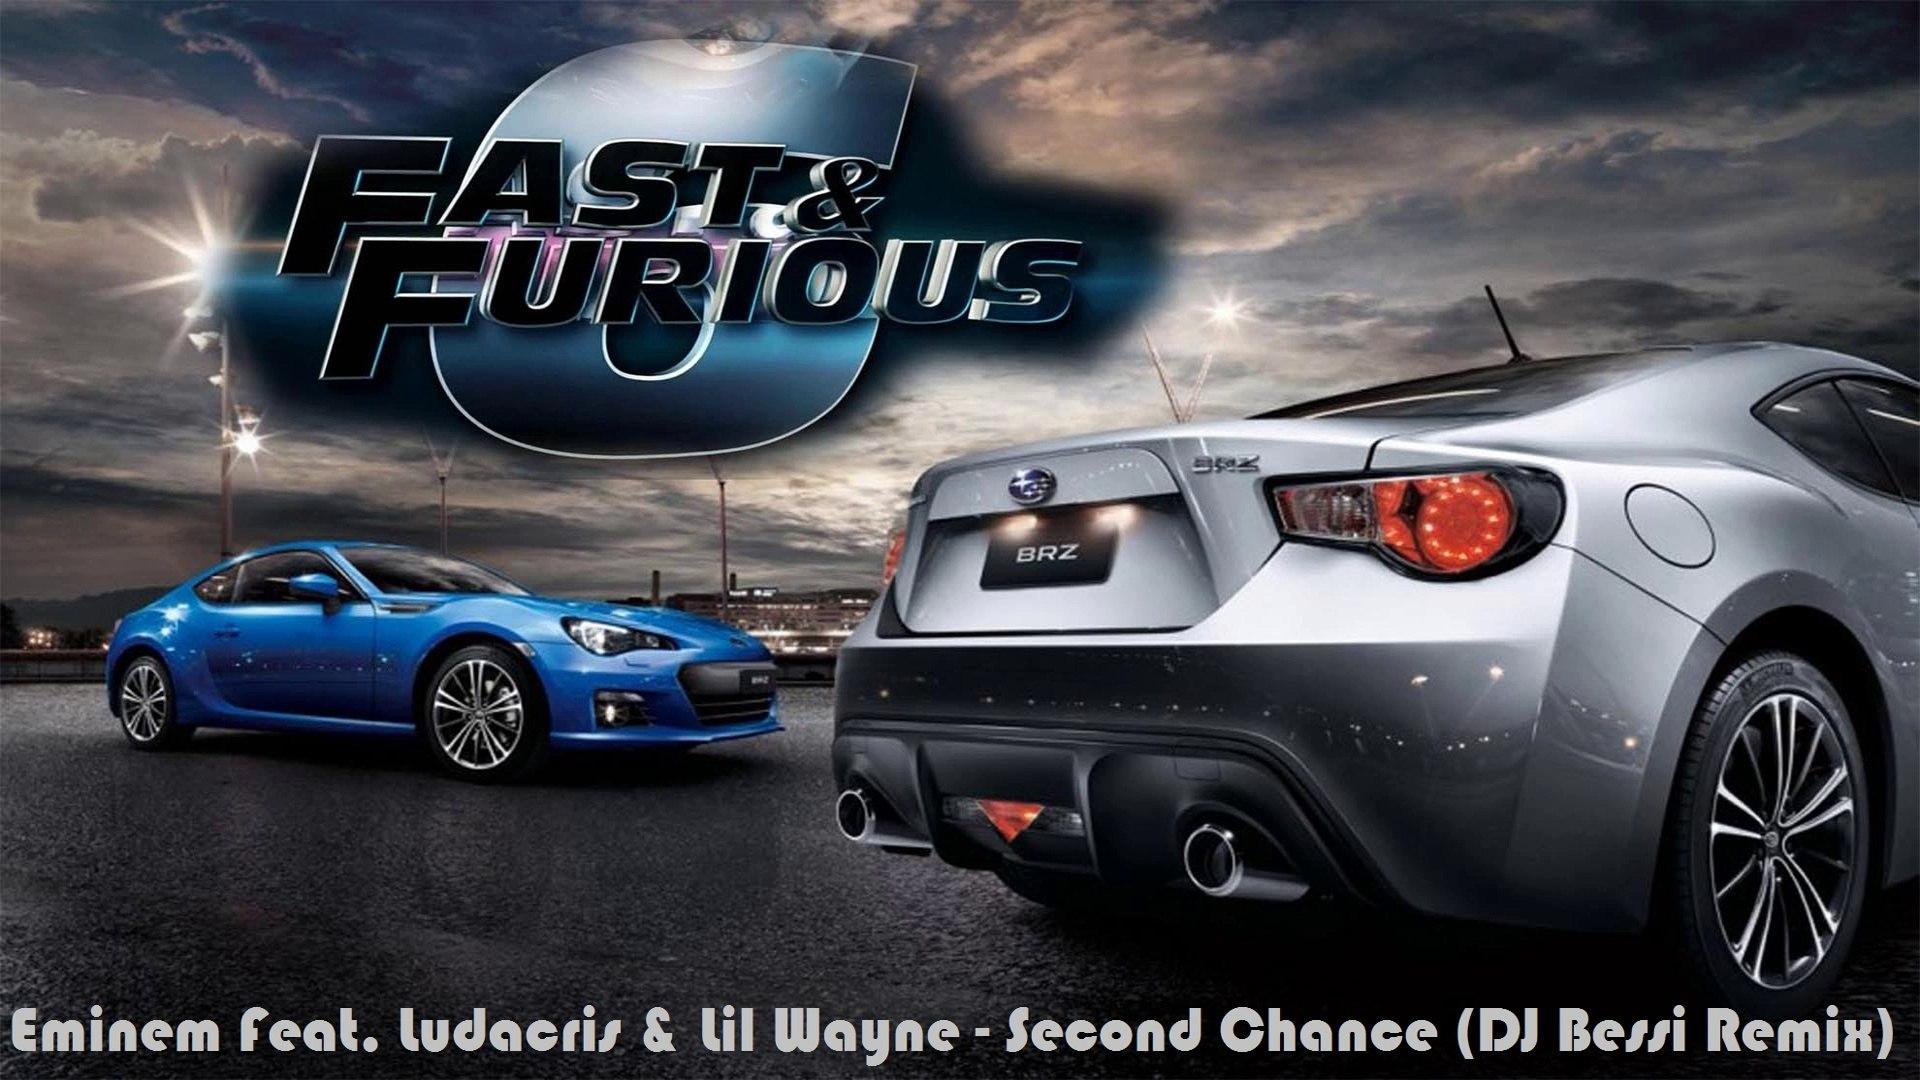 Eminem Feat  Ludacris & Lil Wayne - Second Chance (DJ Bessi Remix)